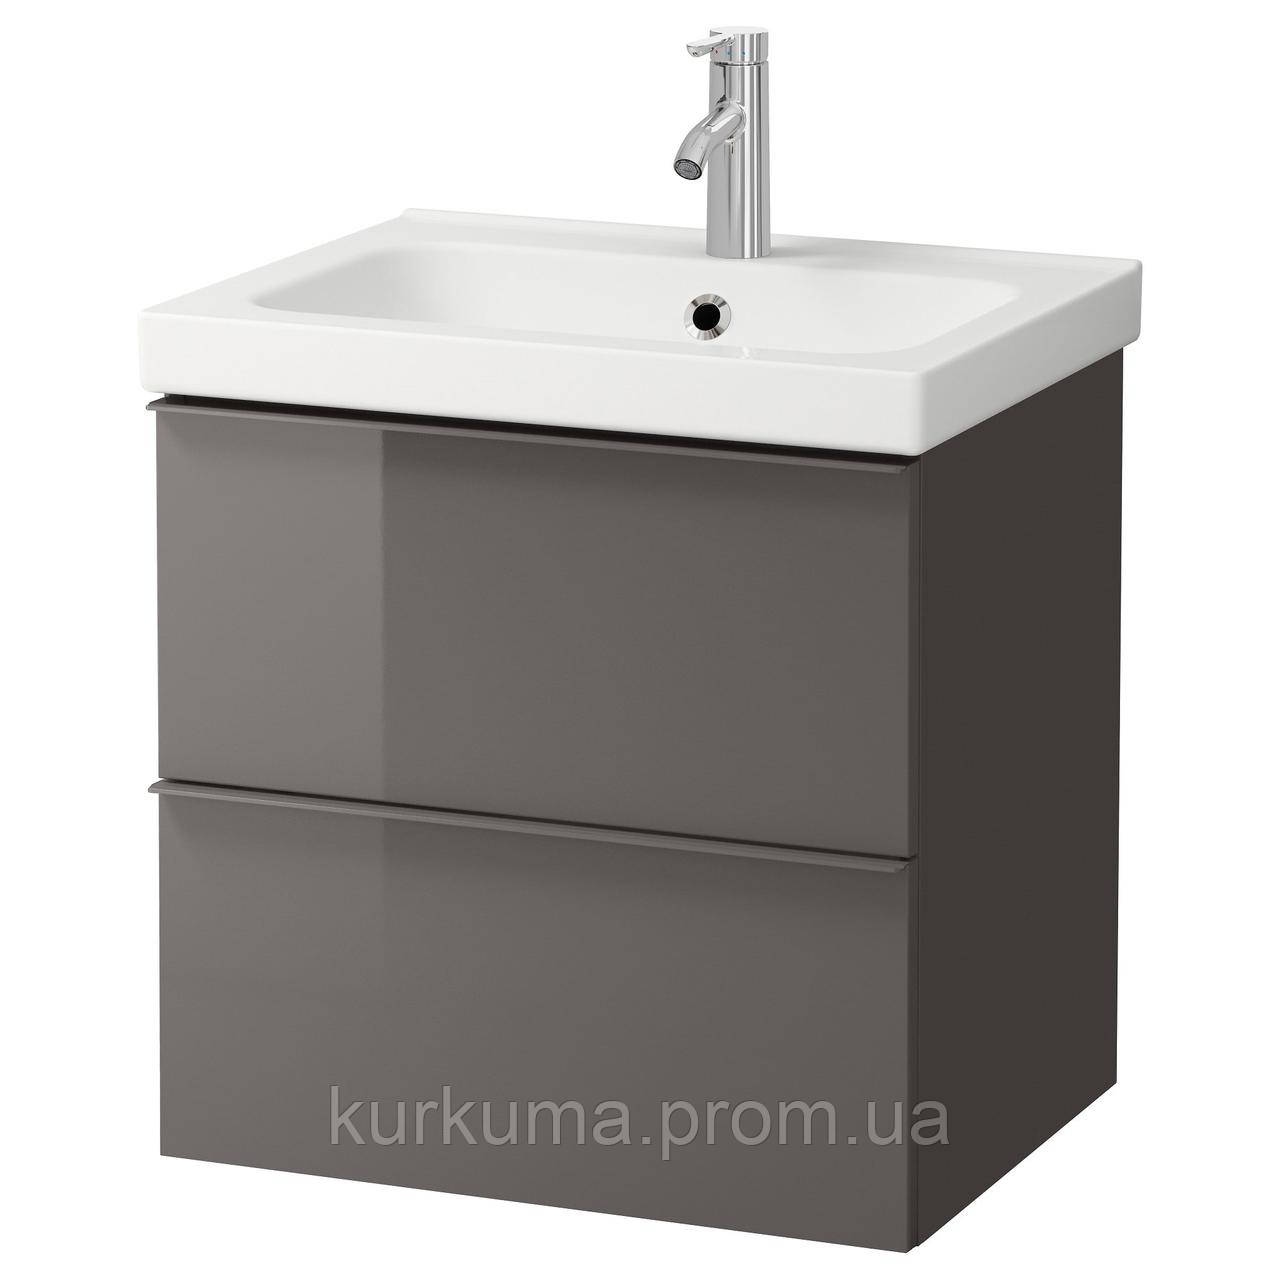 IKEA GODMORGON/ODENSVIK Шкаф под умывальник с раковиной, серый глянцевый серый  (498.843.58)